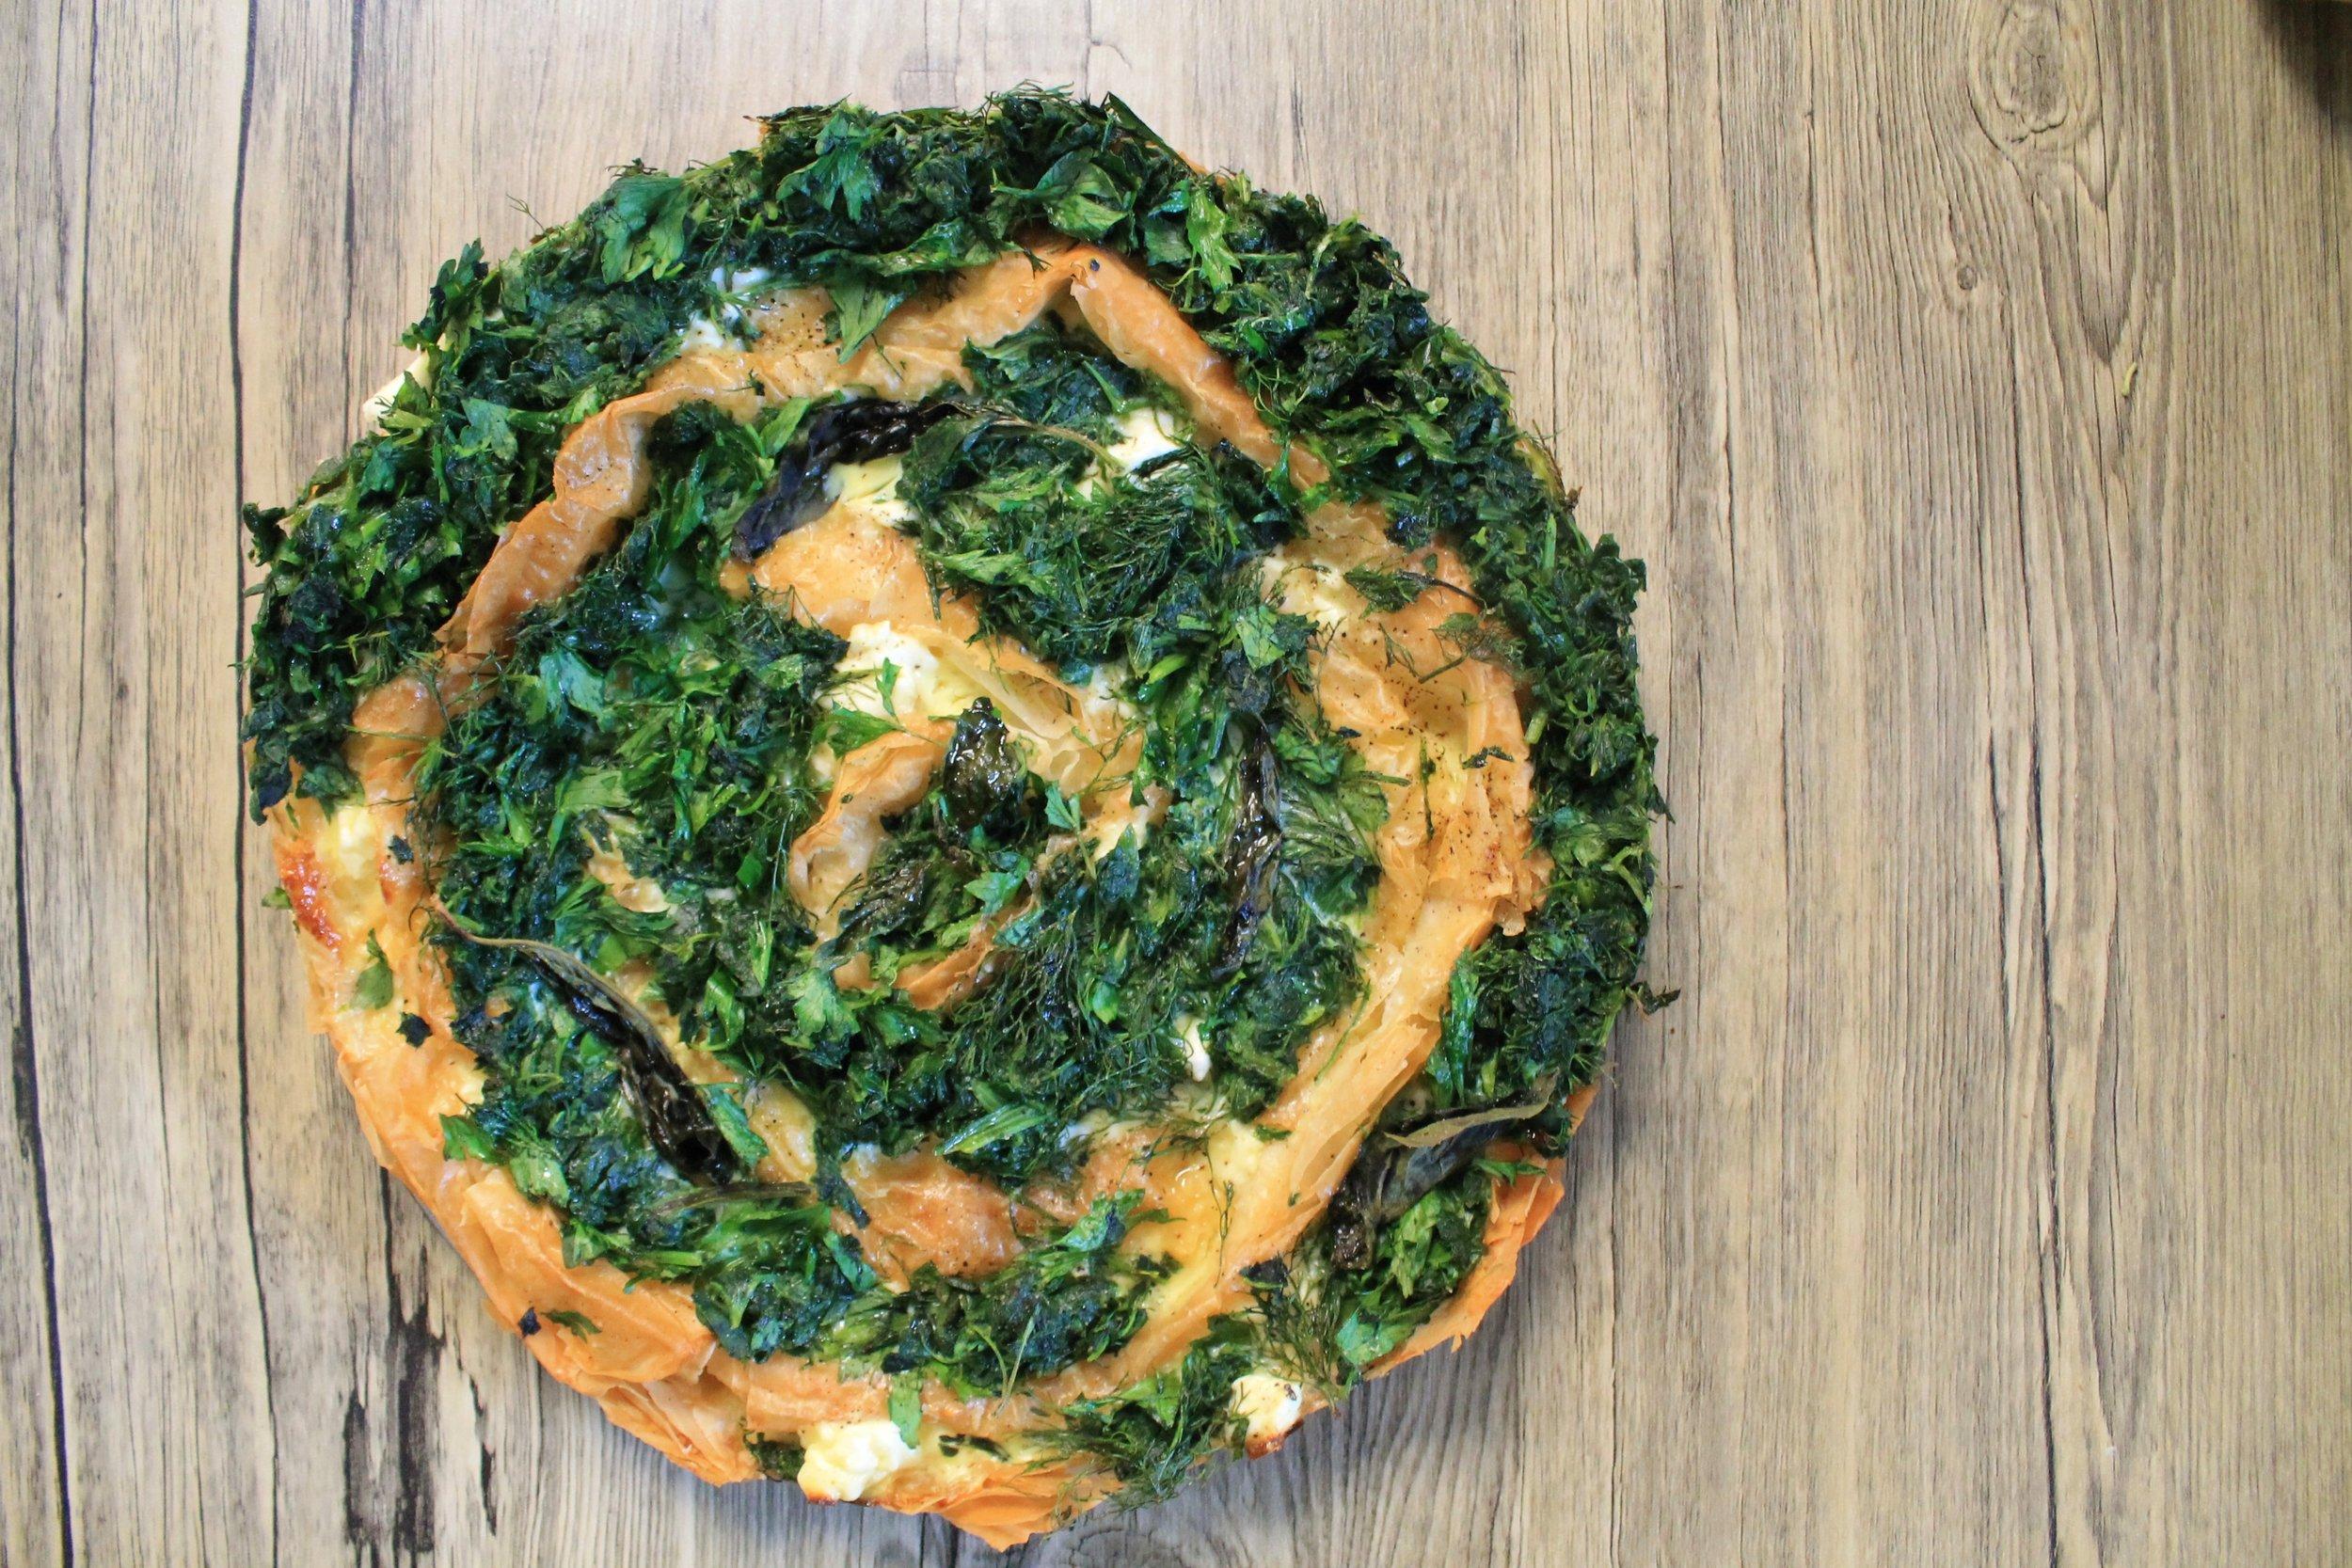 Herb Spiral Tart